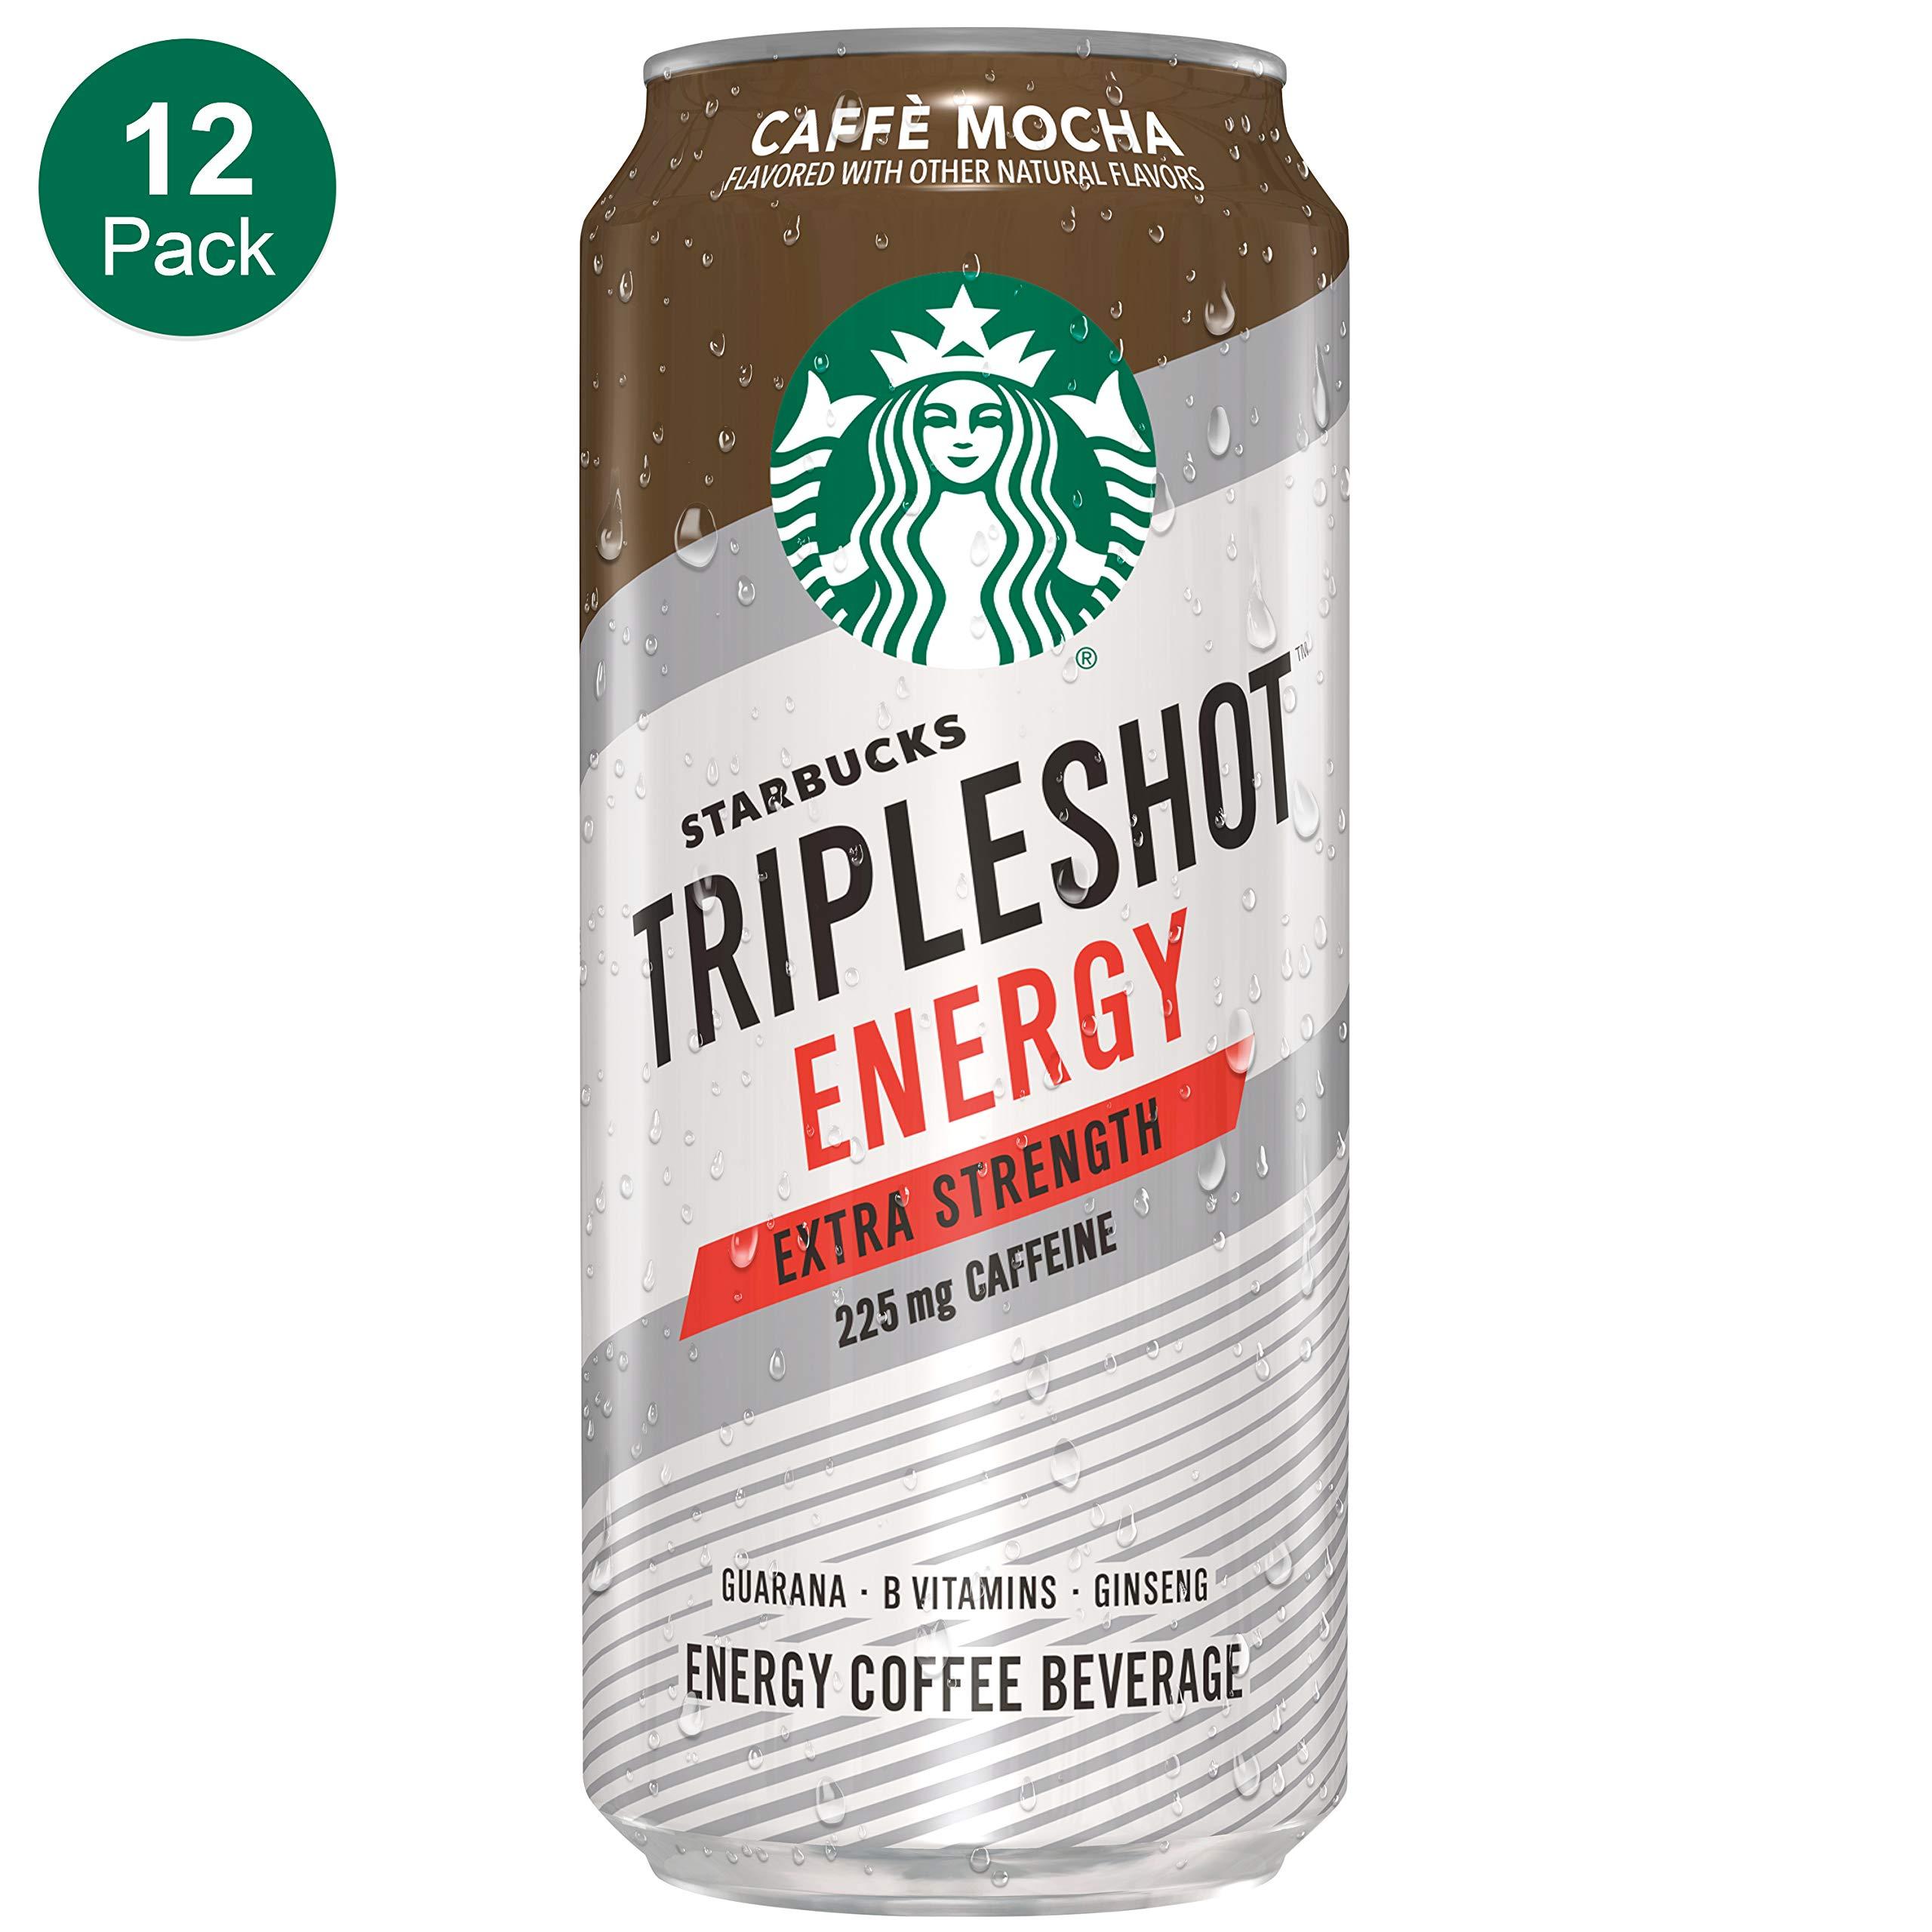 Starbucks, Tripleshot, Cafe Mocha, 15 fl oz. cans (12 Pack) by Starbucks